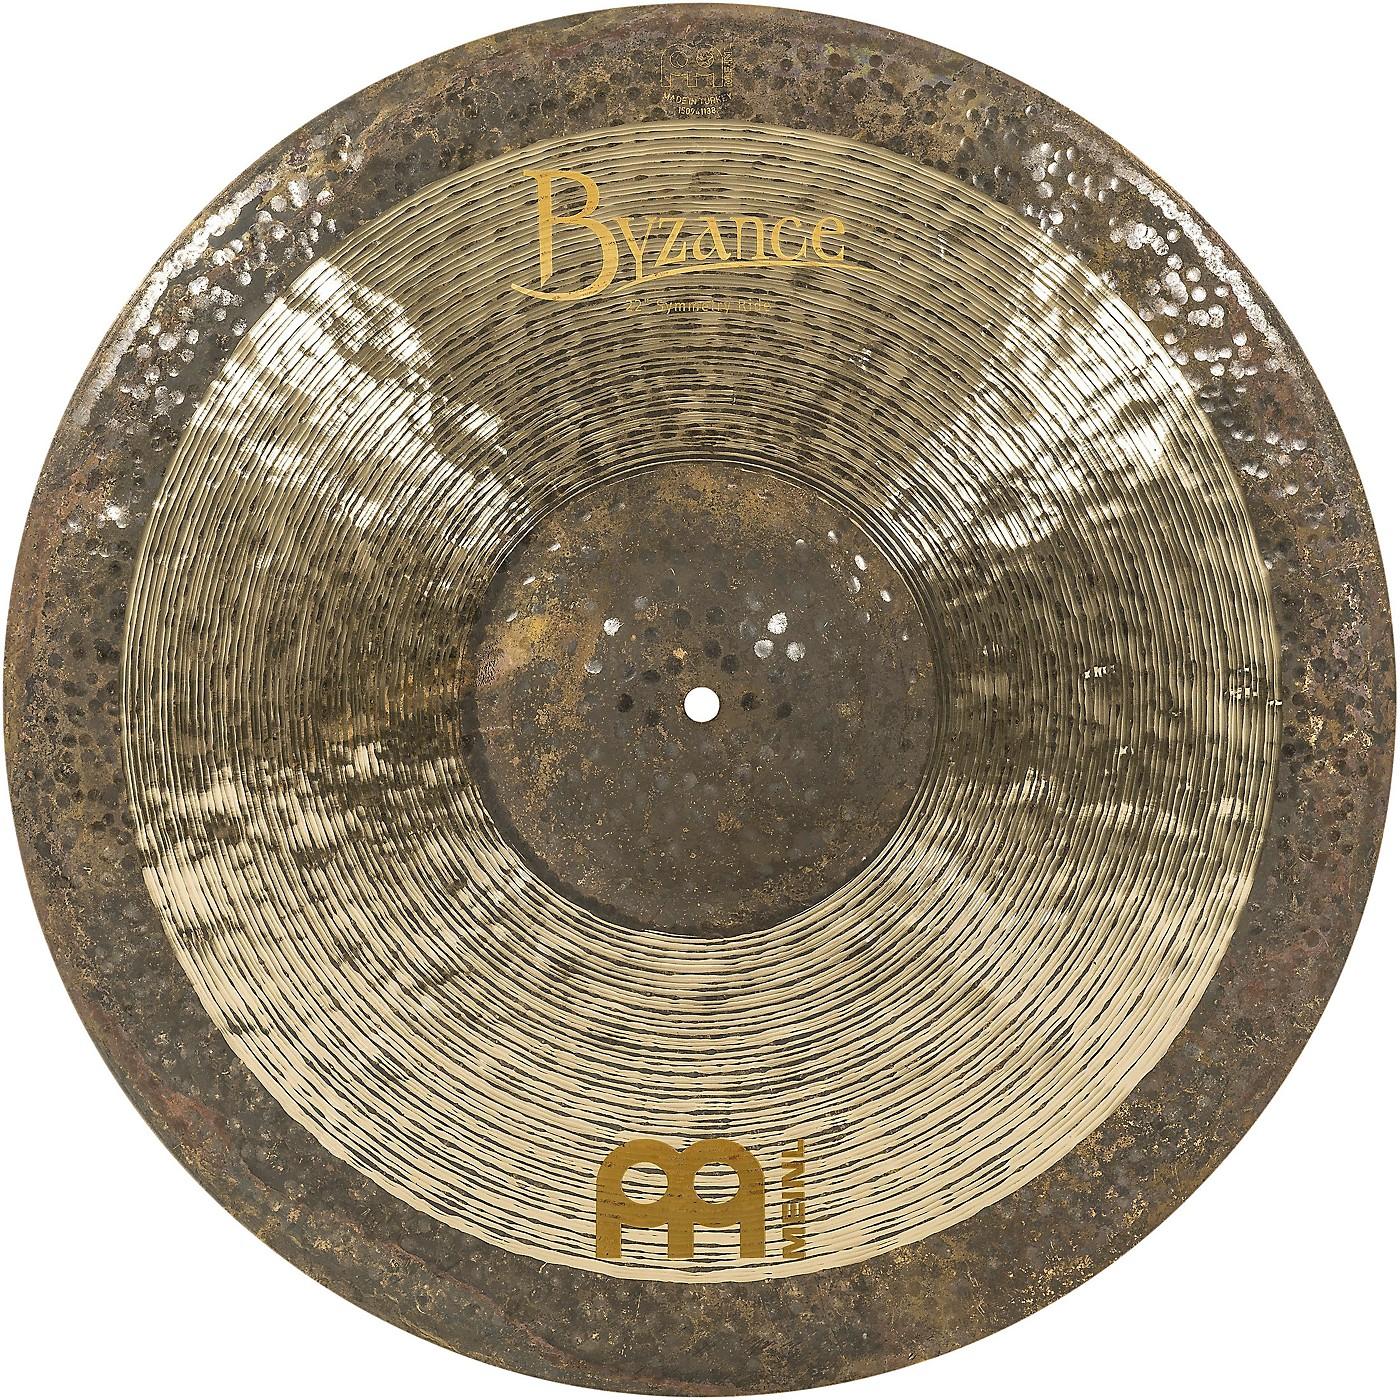 Meinl Byzance Jazz Ralph Peterson Signature Symmetry Ride Cymbal thumbnail